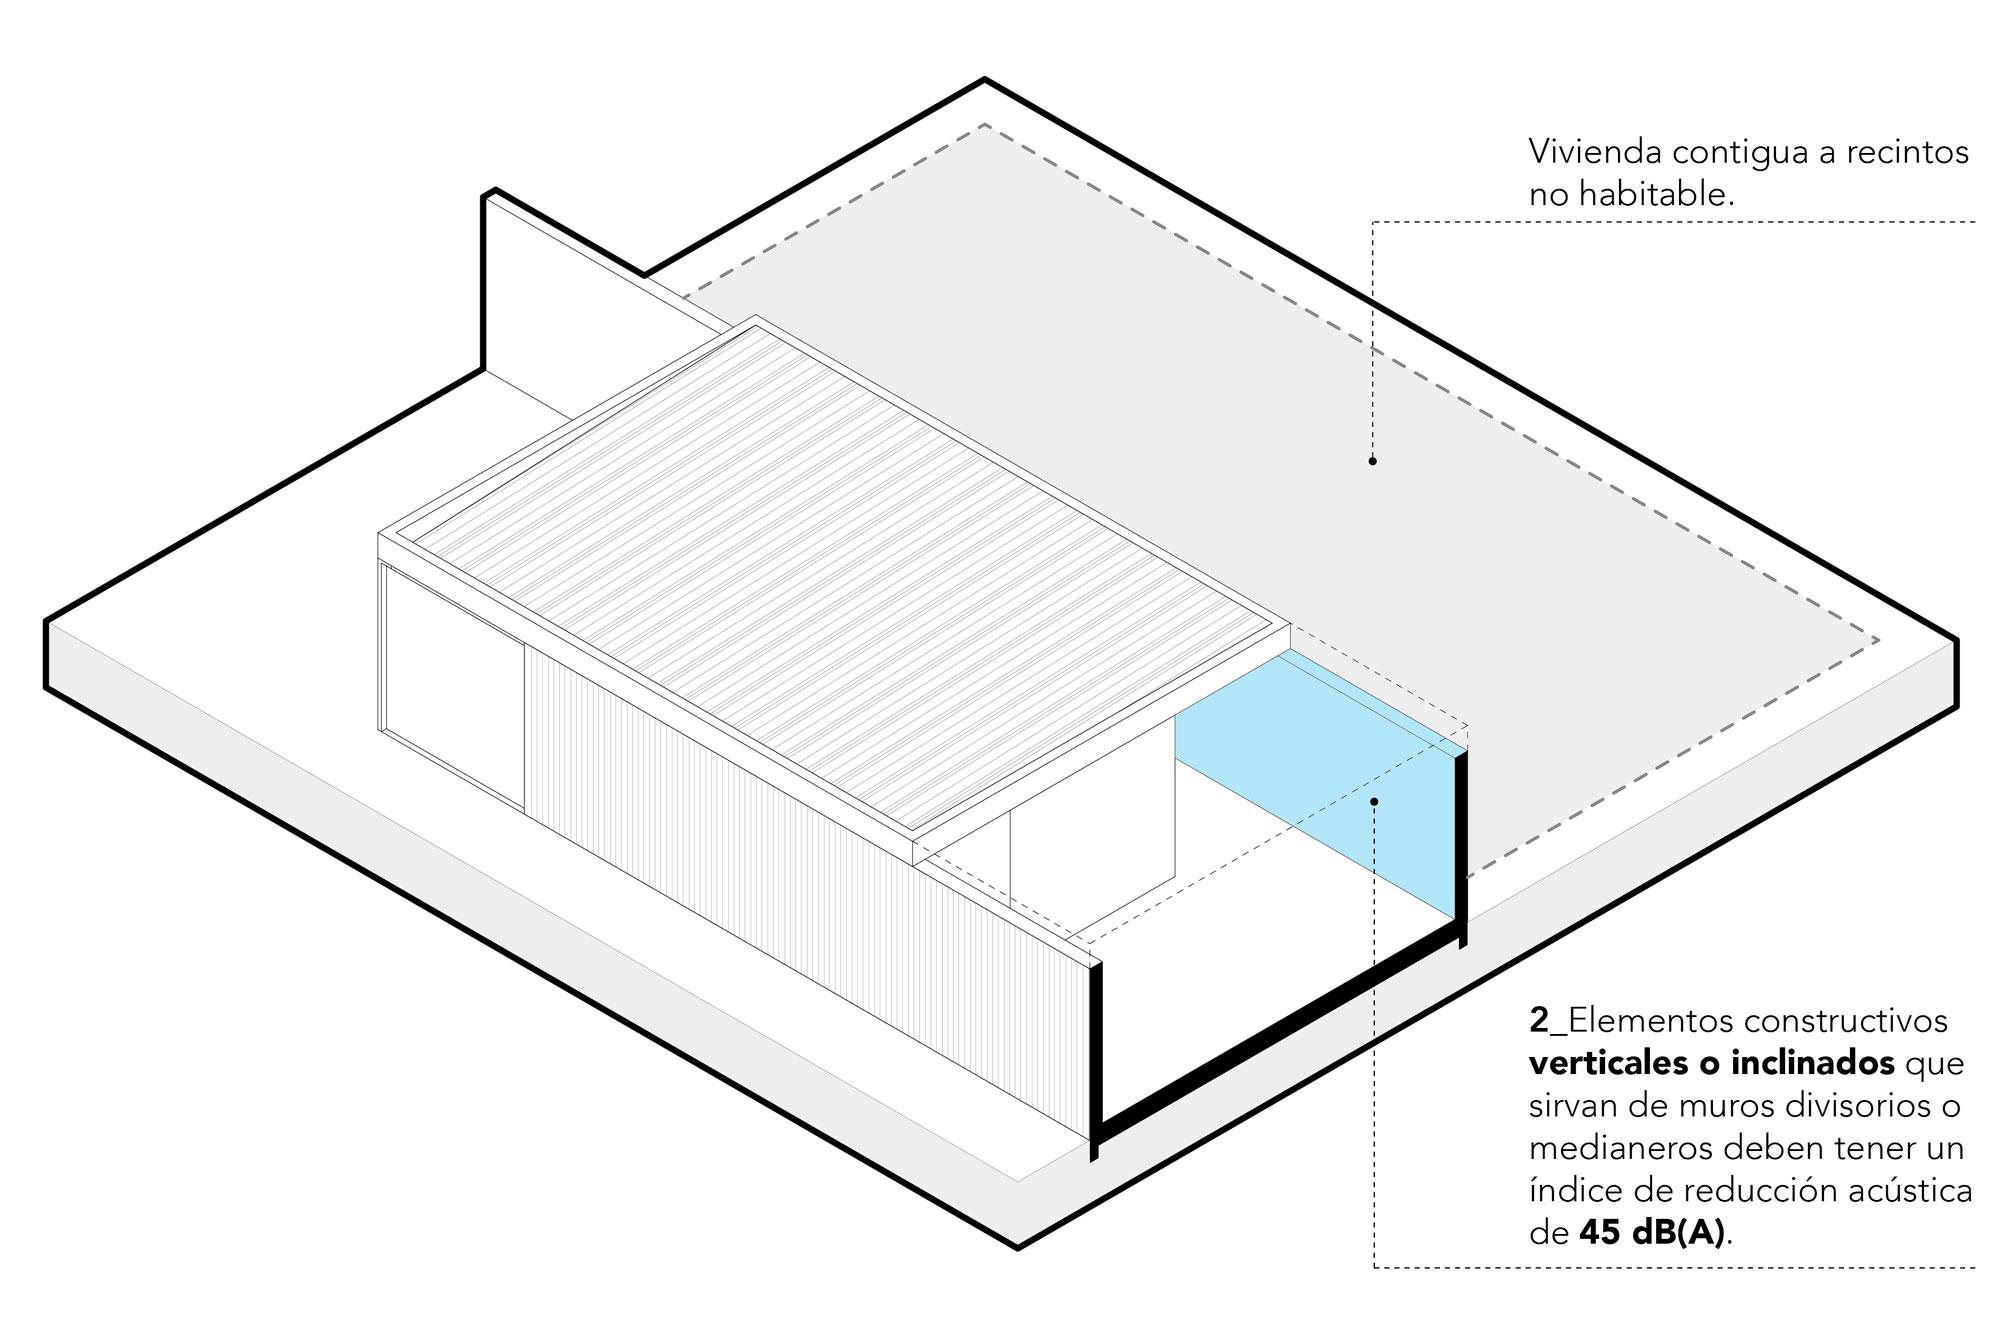 Exigencias acústicas, edificación contigua a recinto no habitable, OGUC, Chile.